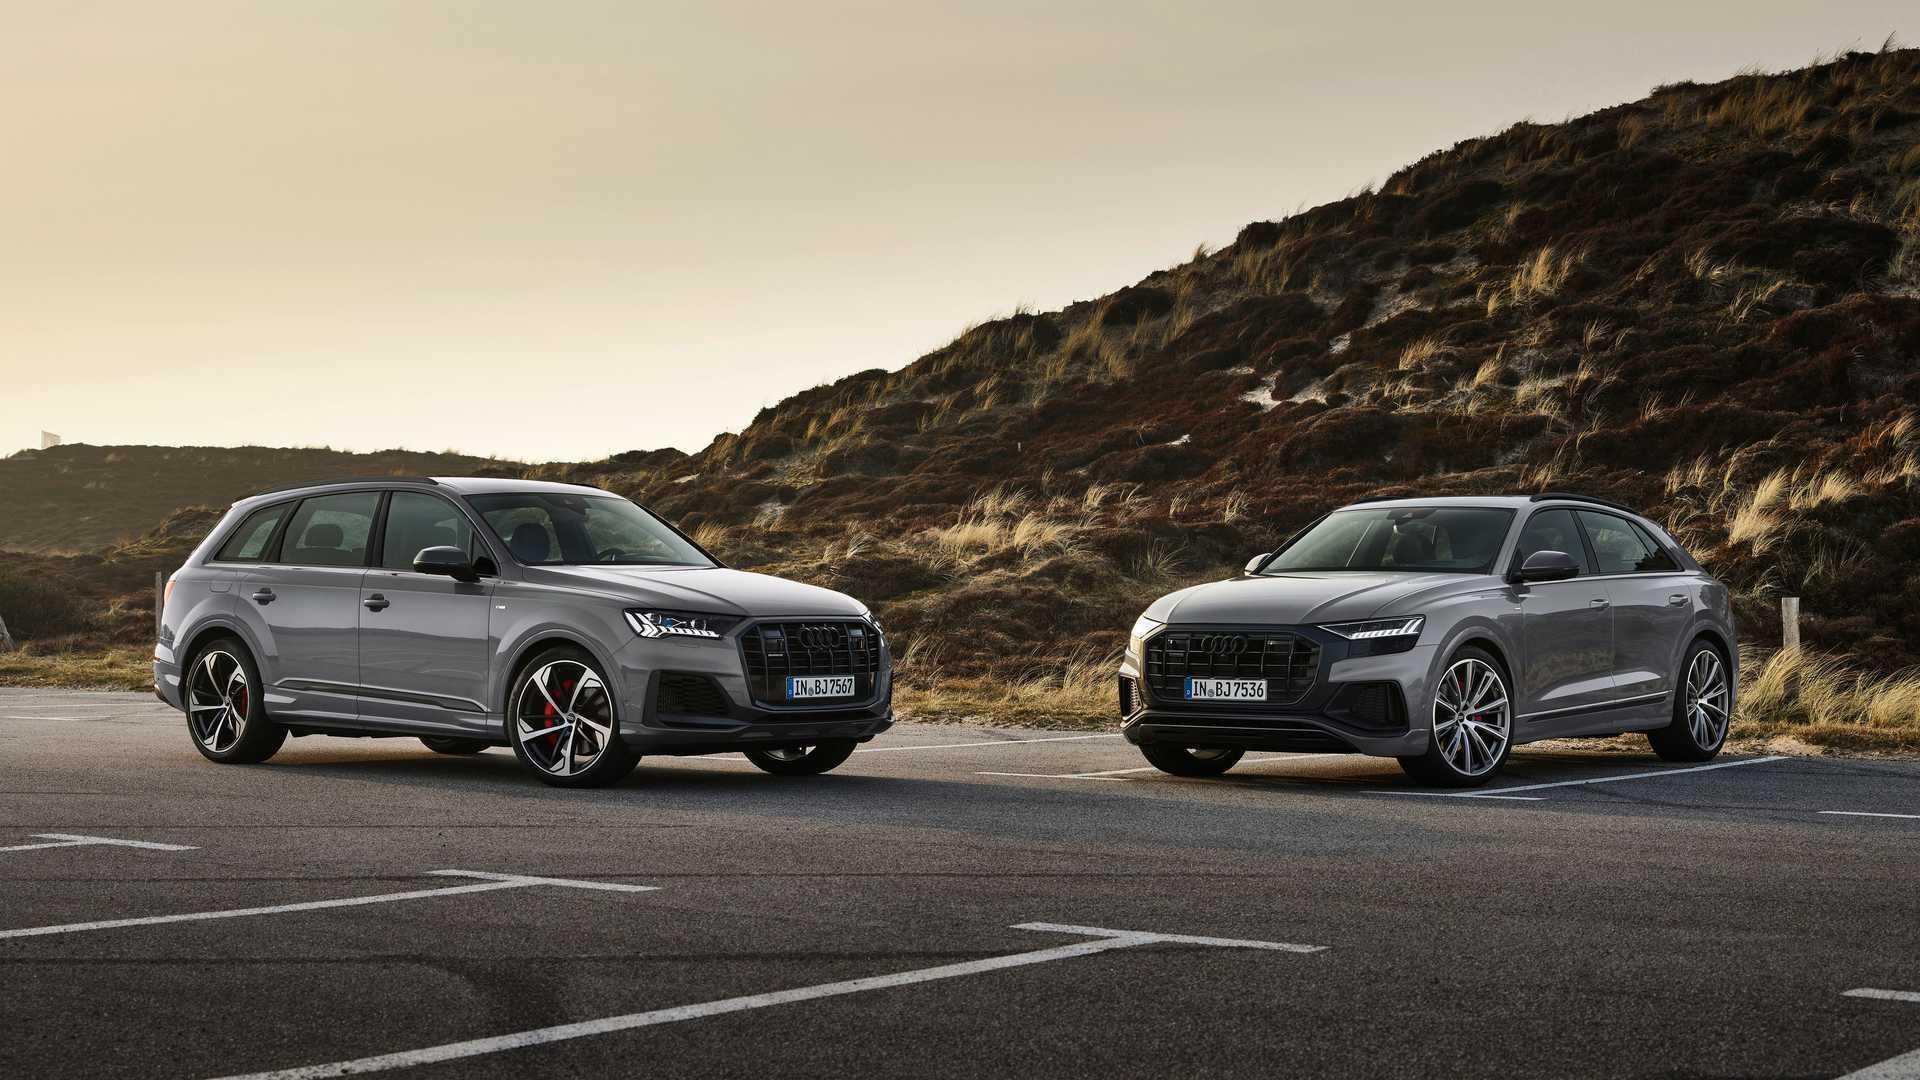 Покупателям Audi Q7 и Q8 будут предложены версии в исполнении competition plus